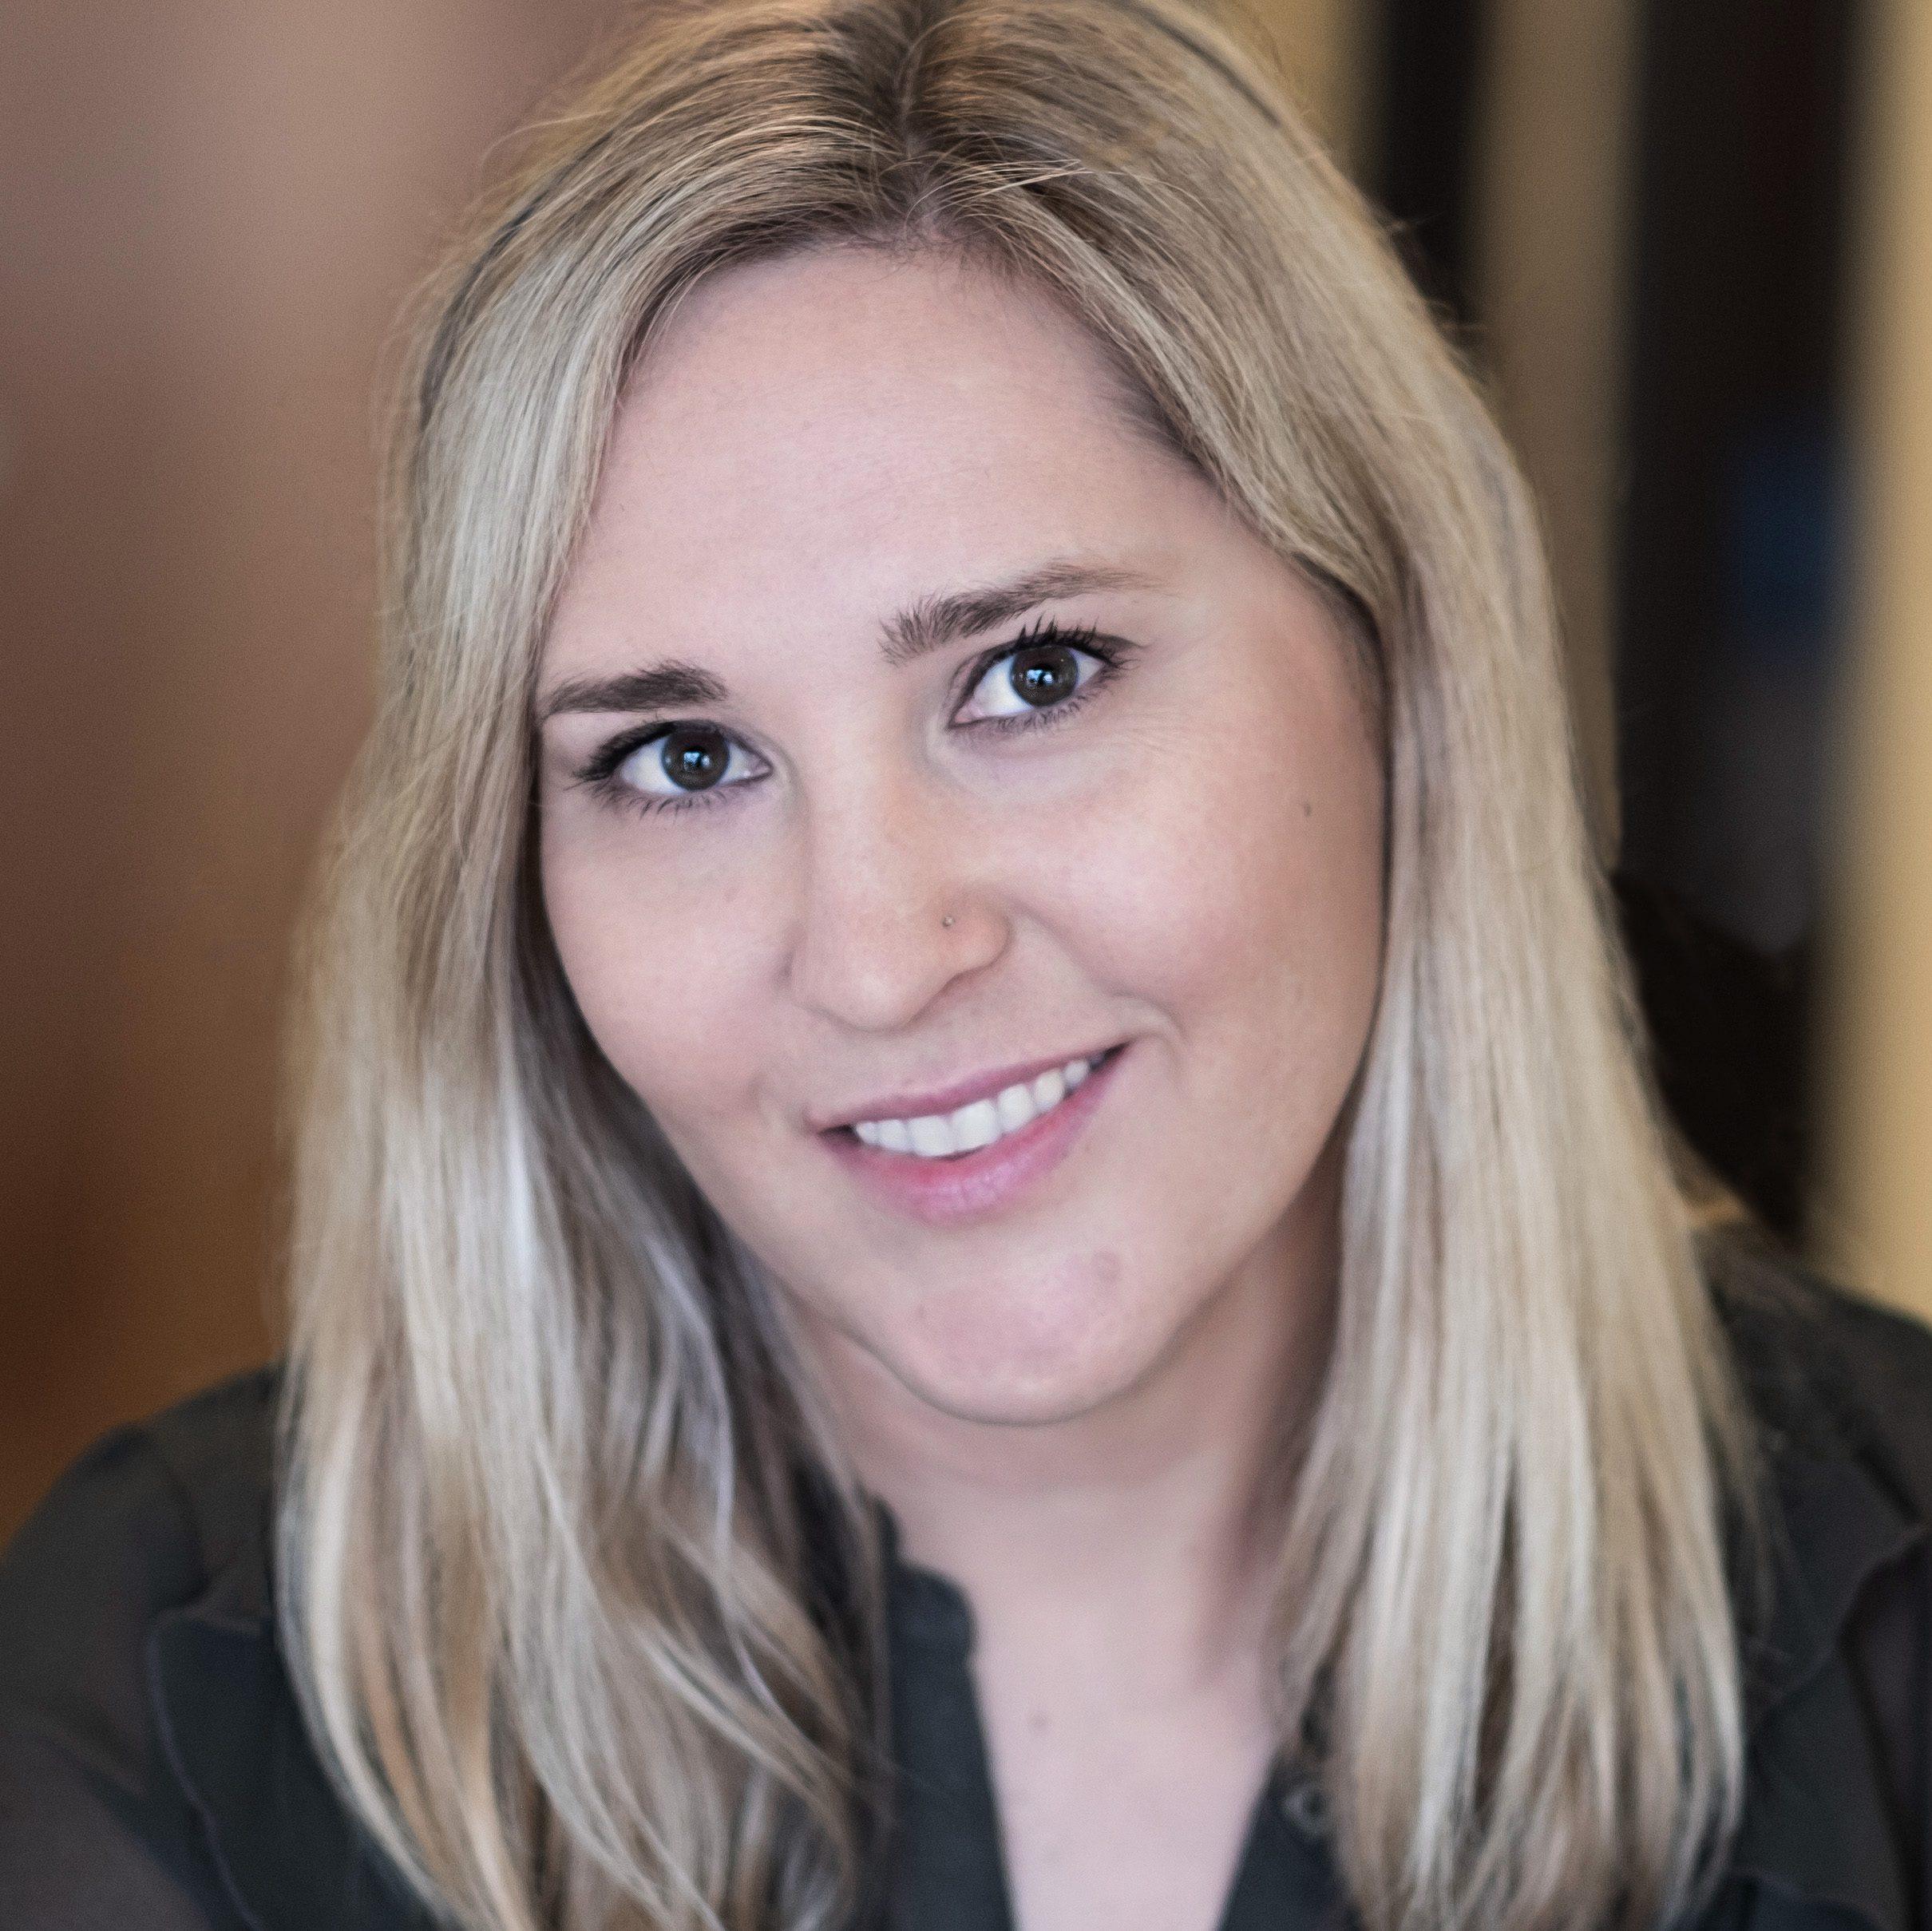 Renee Landon-Lane, Au.D. : Doctor of Audiology